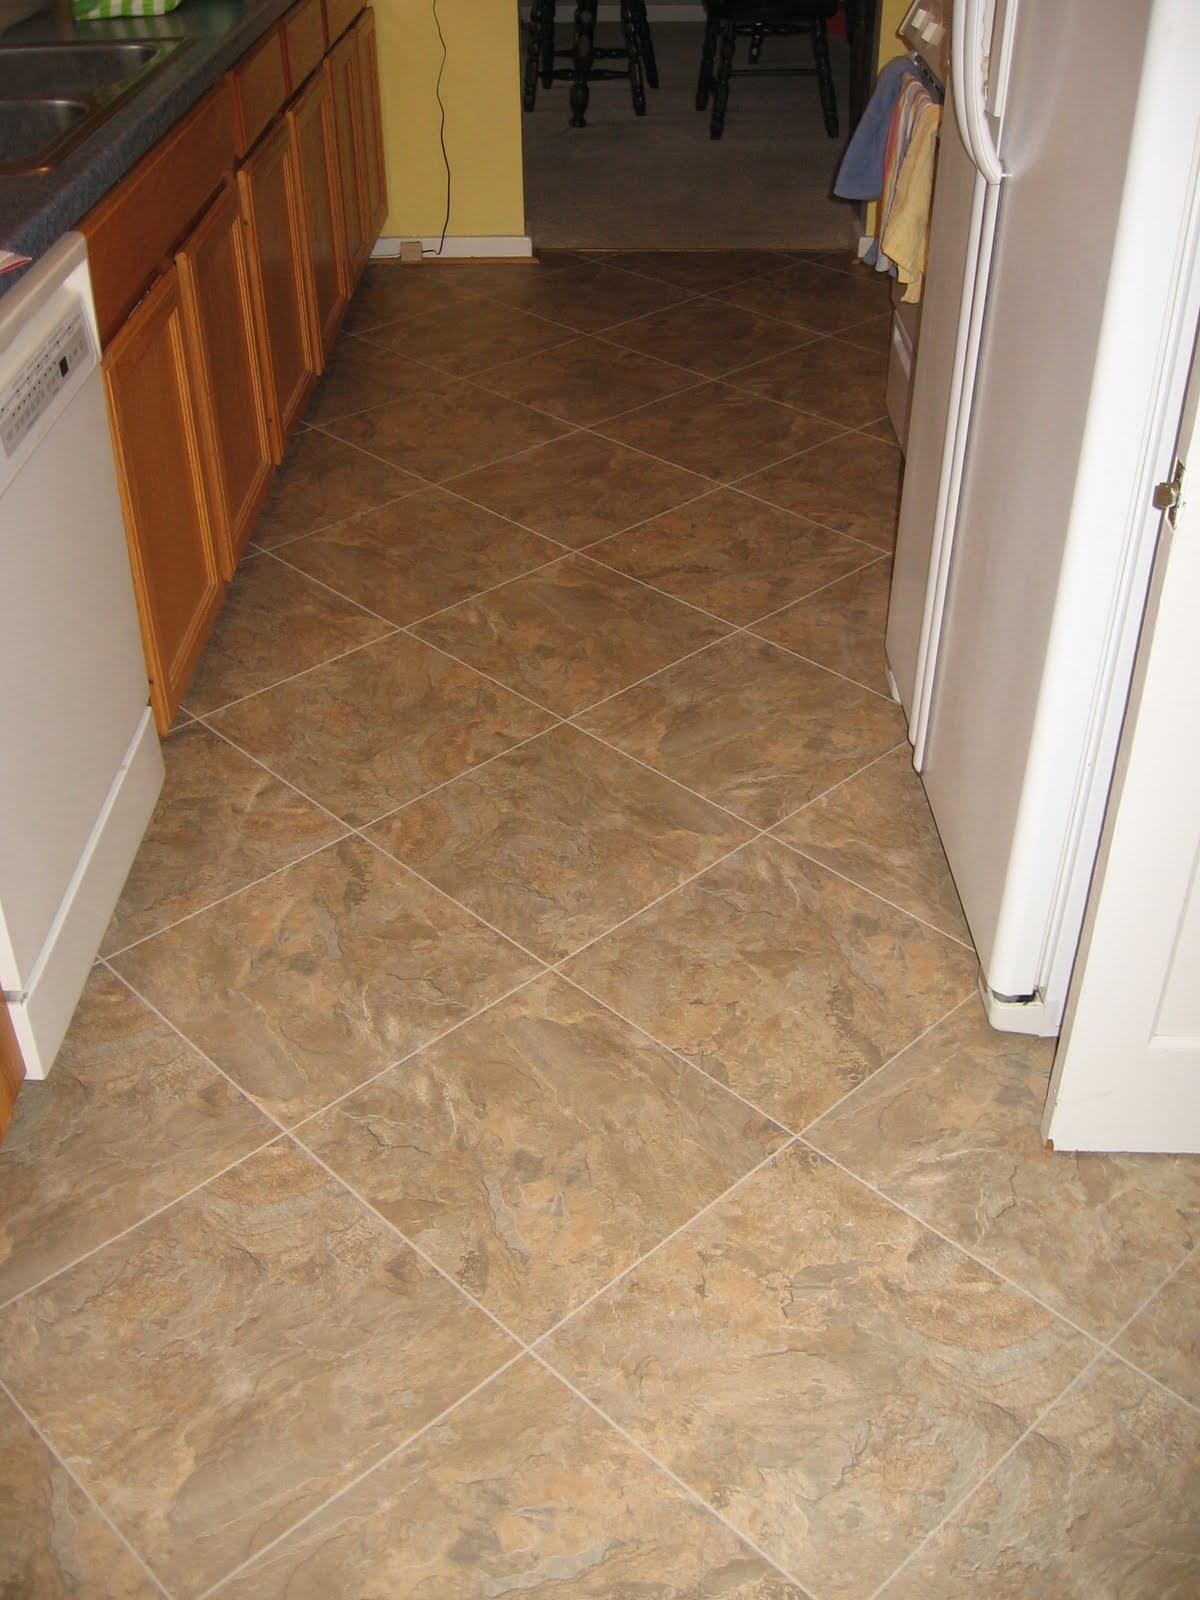 best floor tile ideas kitchen floor tiles ideas polished porcelain OQRVTSN